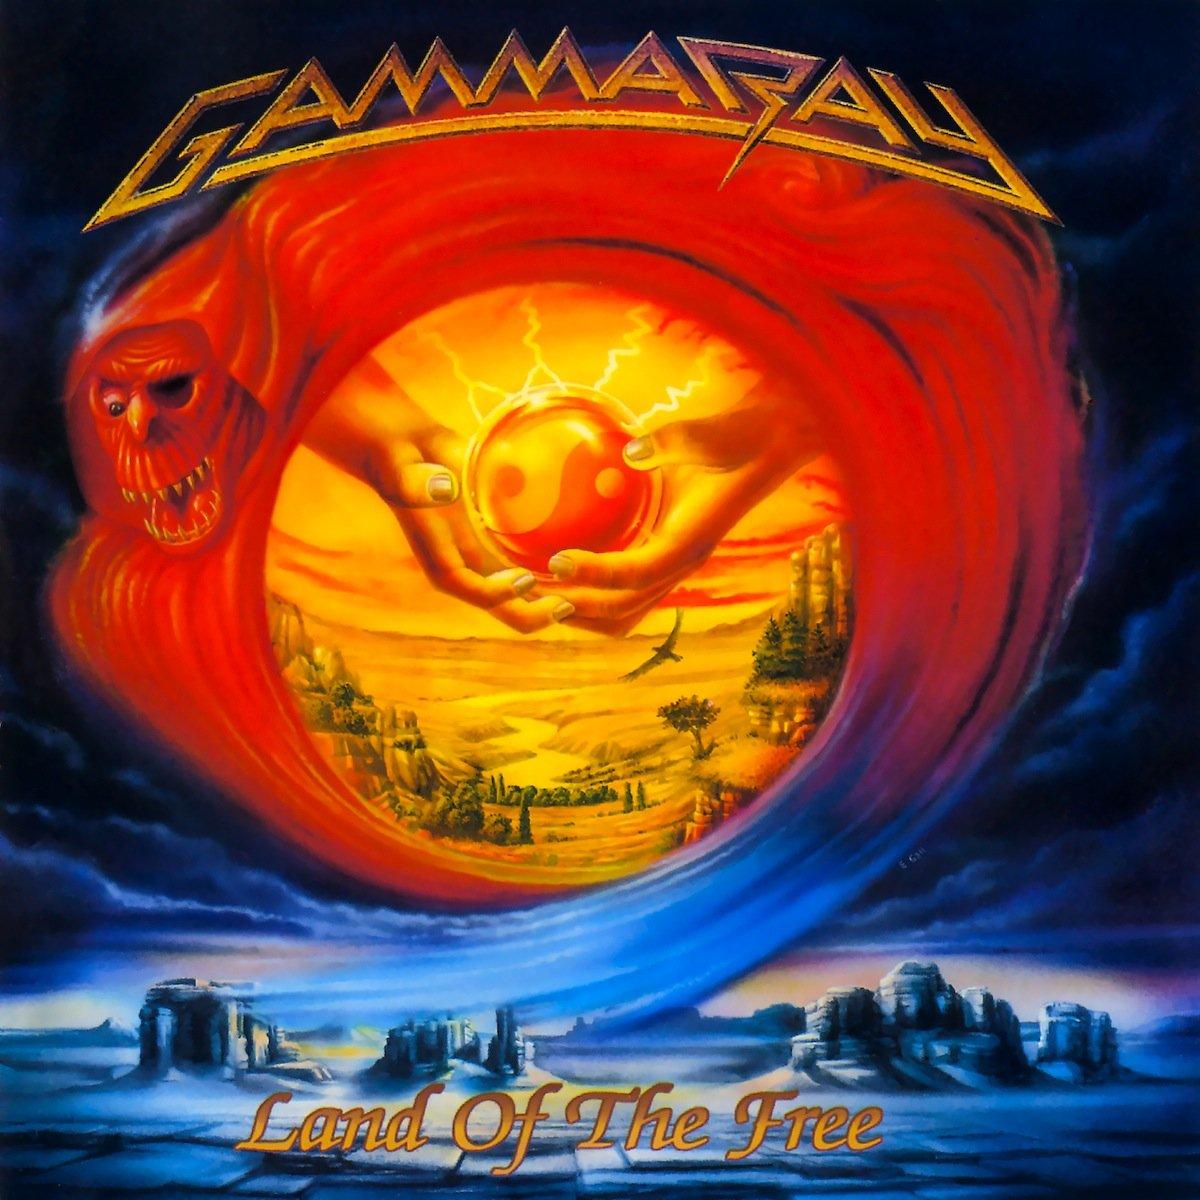 Gamma Ray - Land of the Free Artwork (1 of 13) | Last.fm